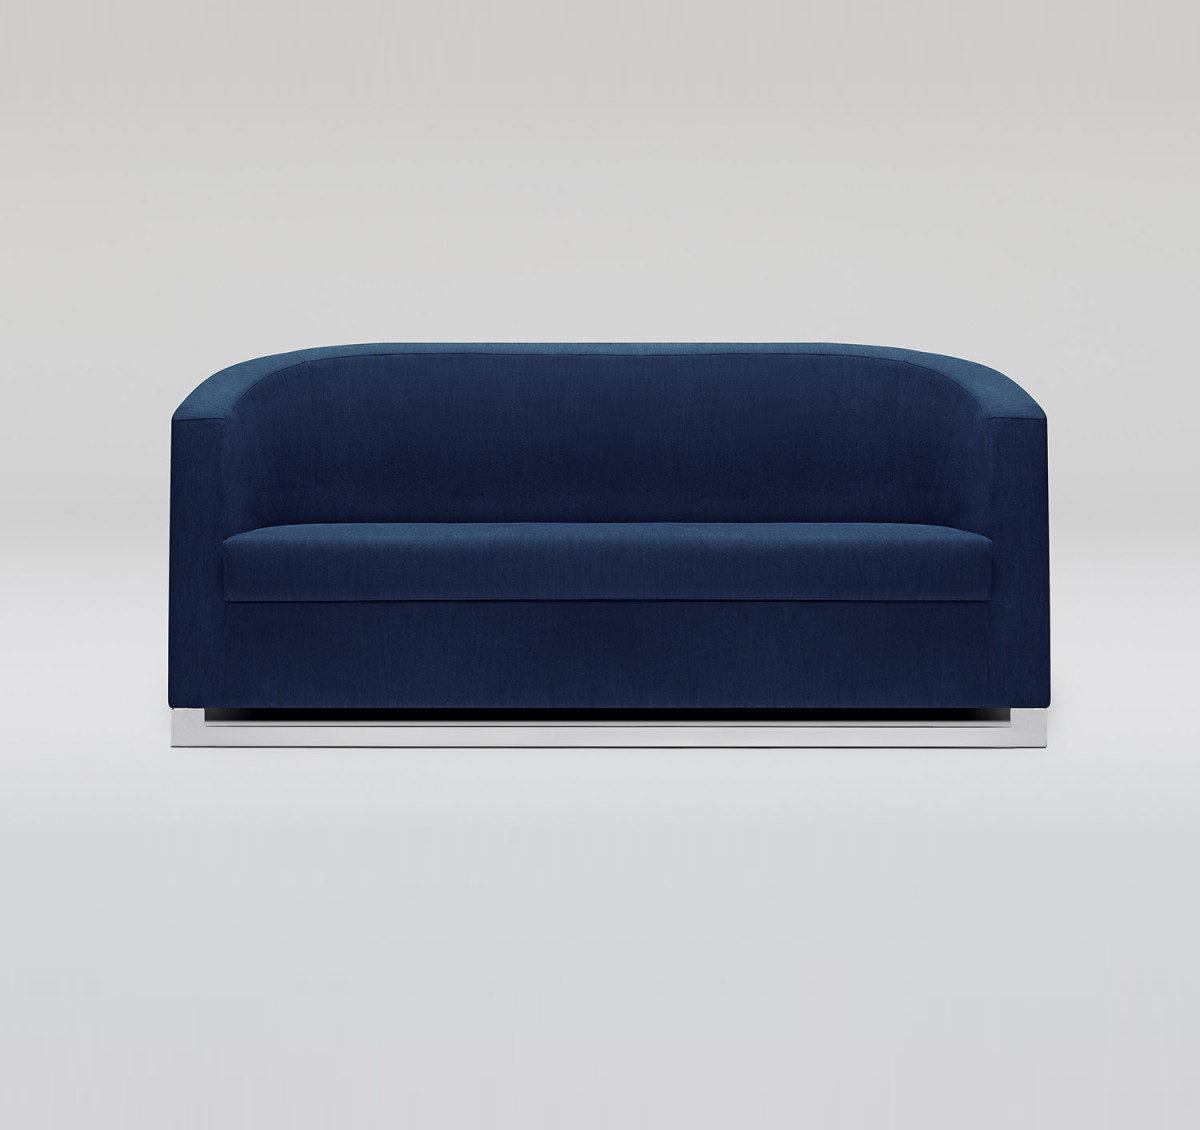 marbet_style_sofa_noble